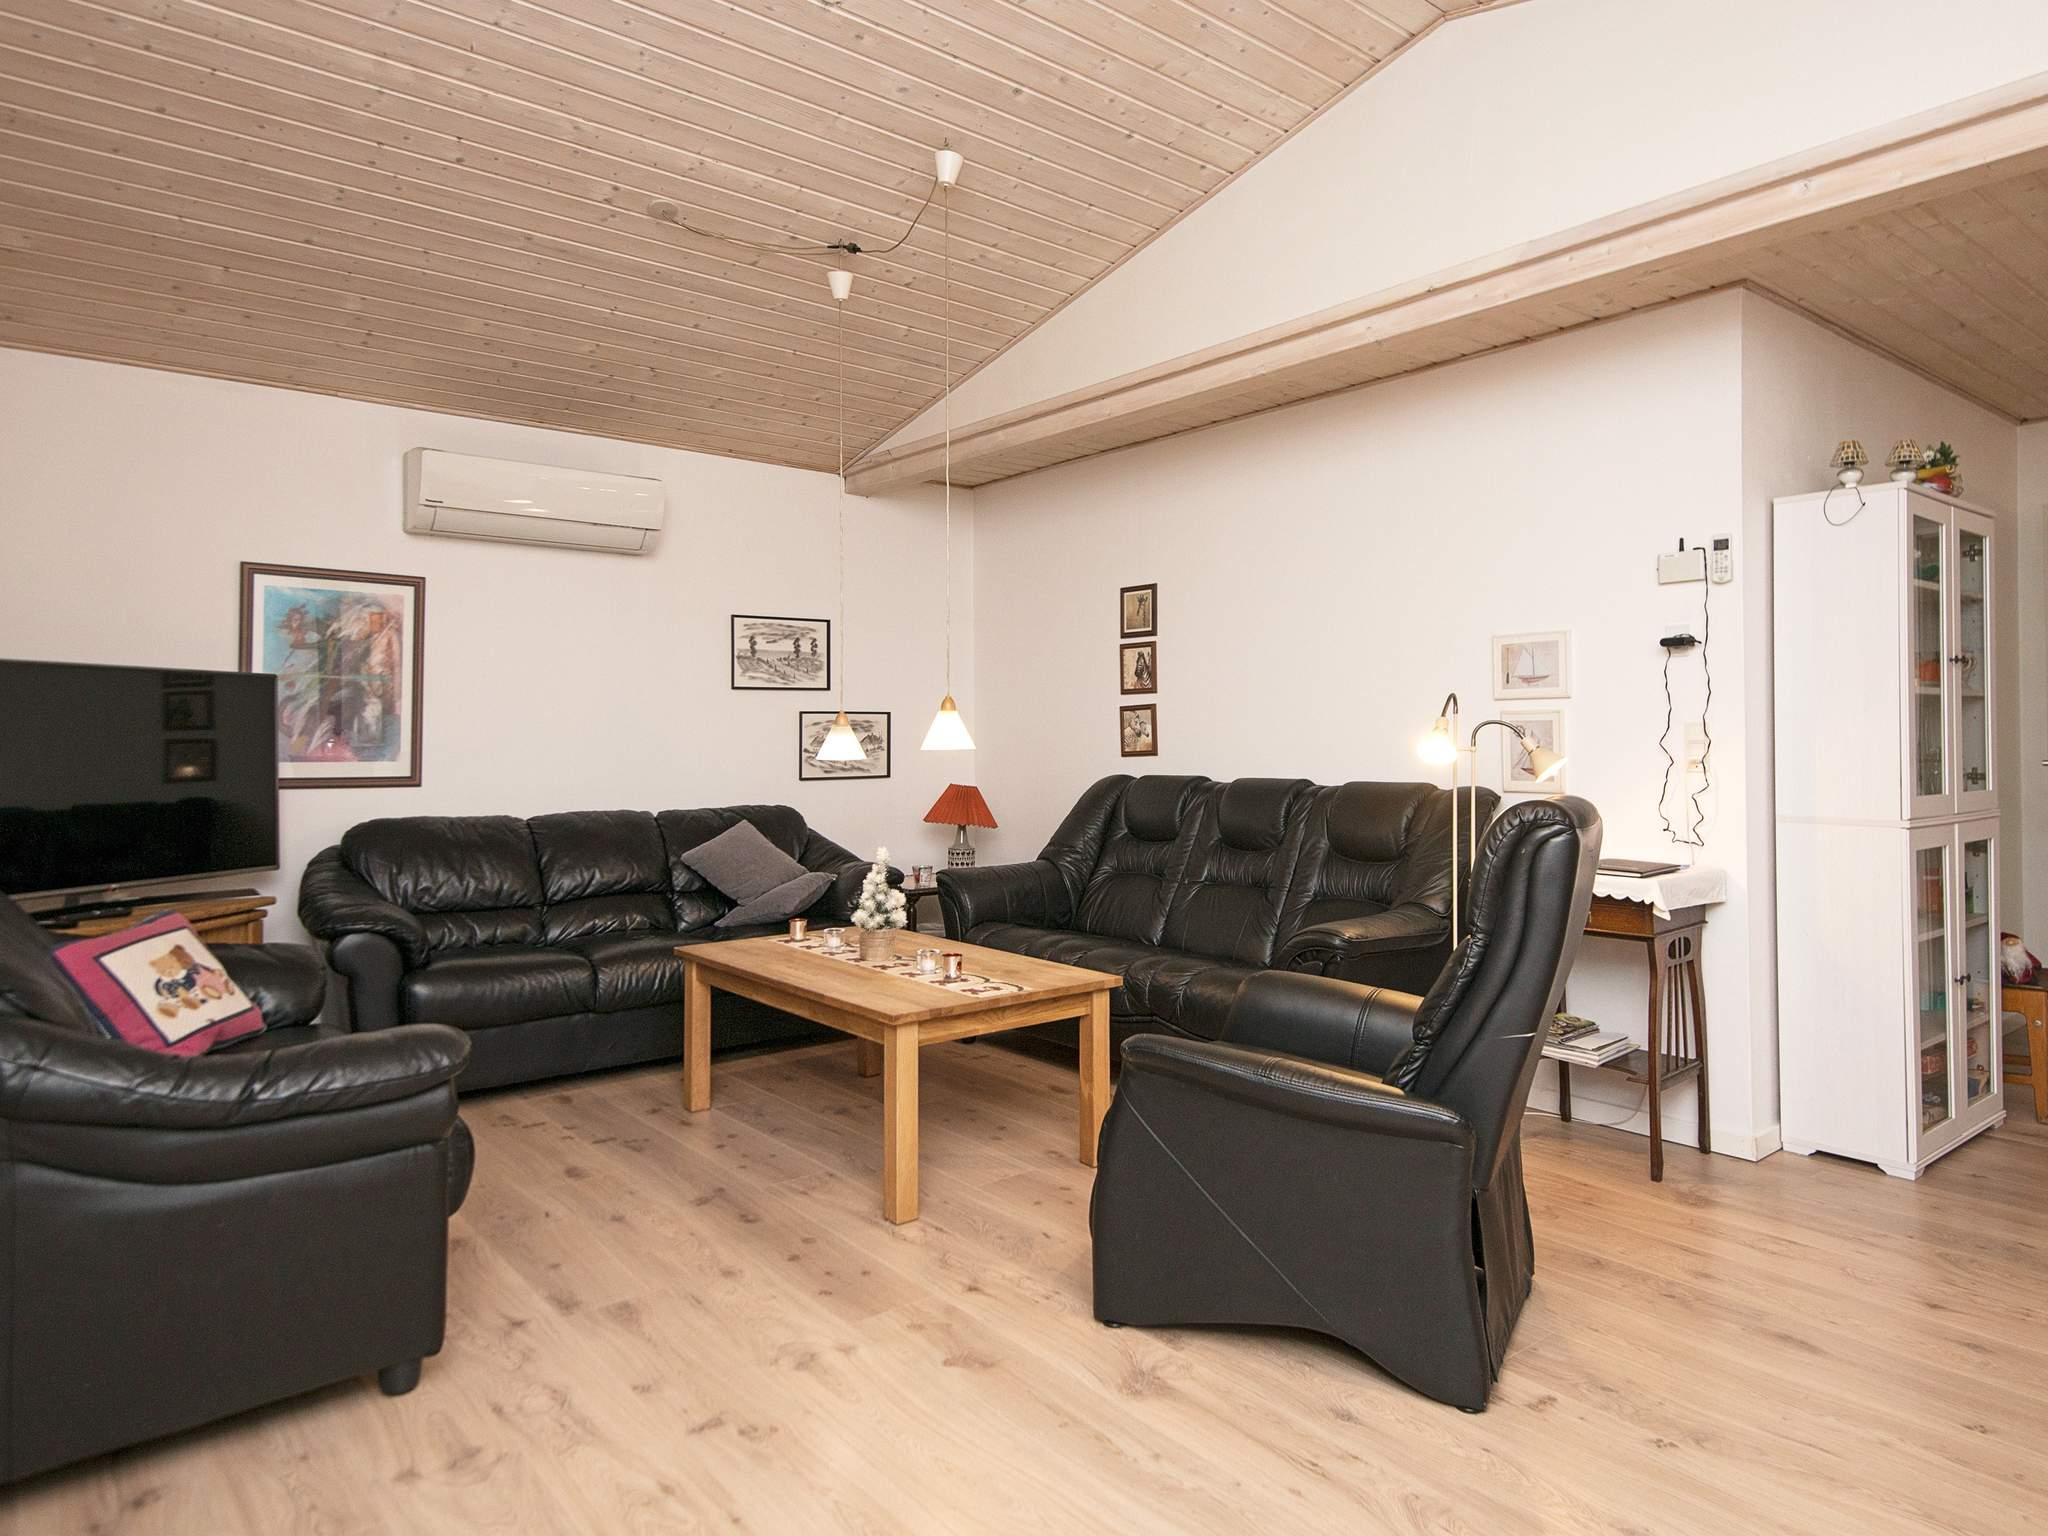 Ferienhaus Arrild (730074), Arrild, , Südwestjütland, Dänemark, Bild 2